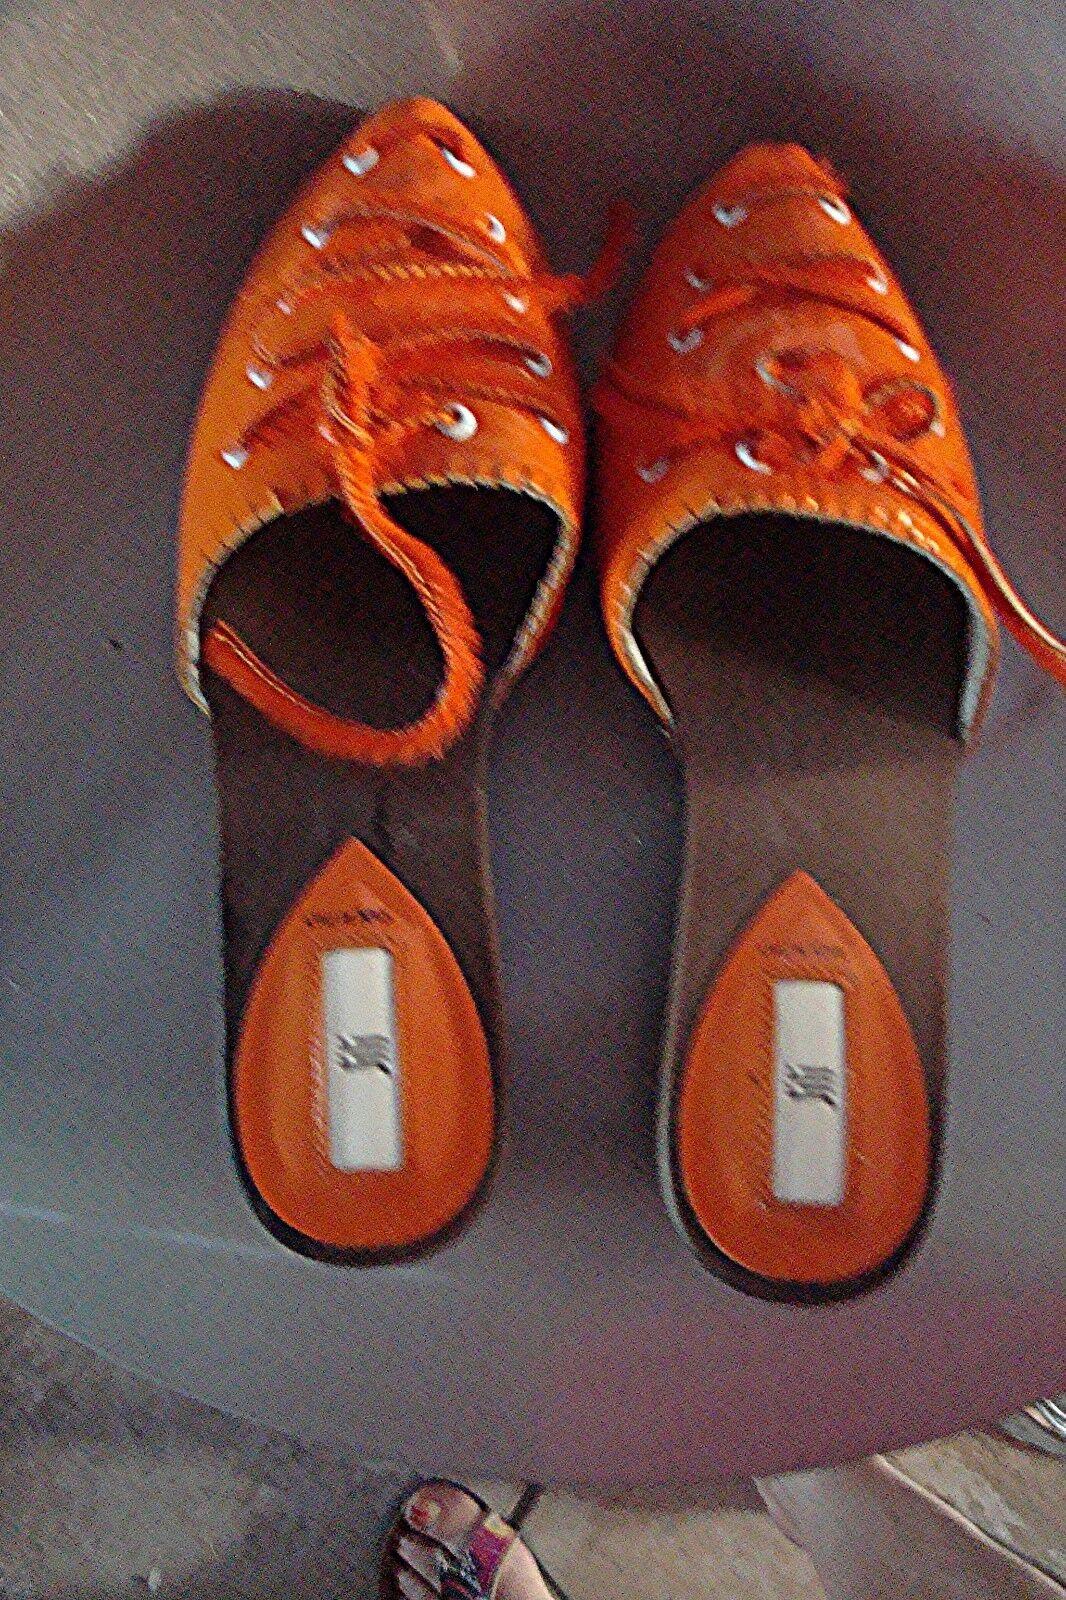 SABOT NU PIED JILI ORIGINAL EN VRAI CUIR  VERNI Orange NEUVE P 37 38 VALEUR